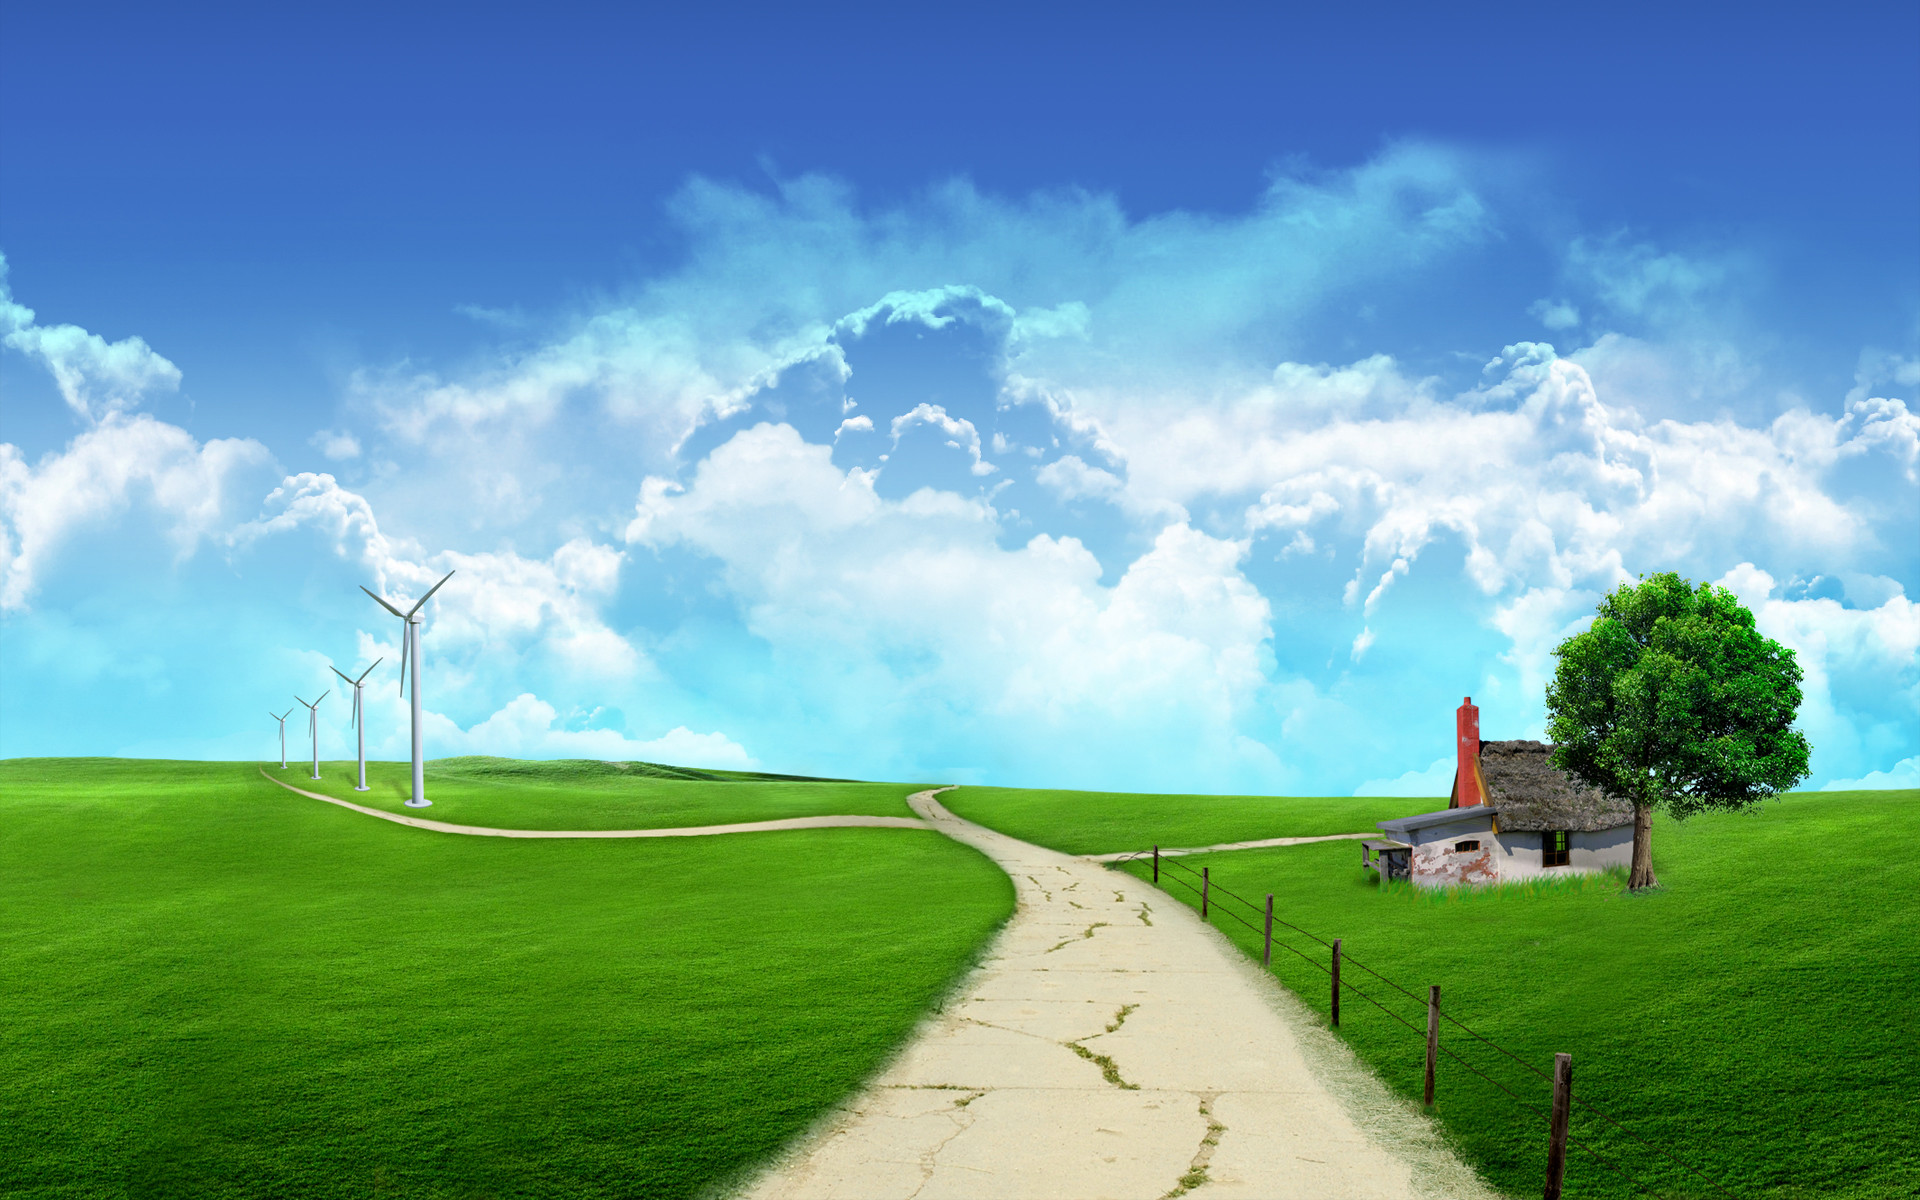 wallpapers summer scenery animated wallpaper seasons 1920×1200